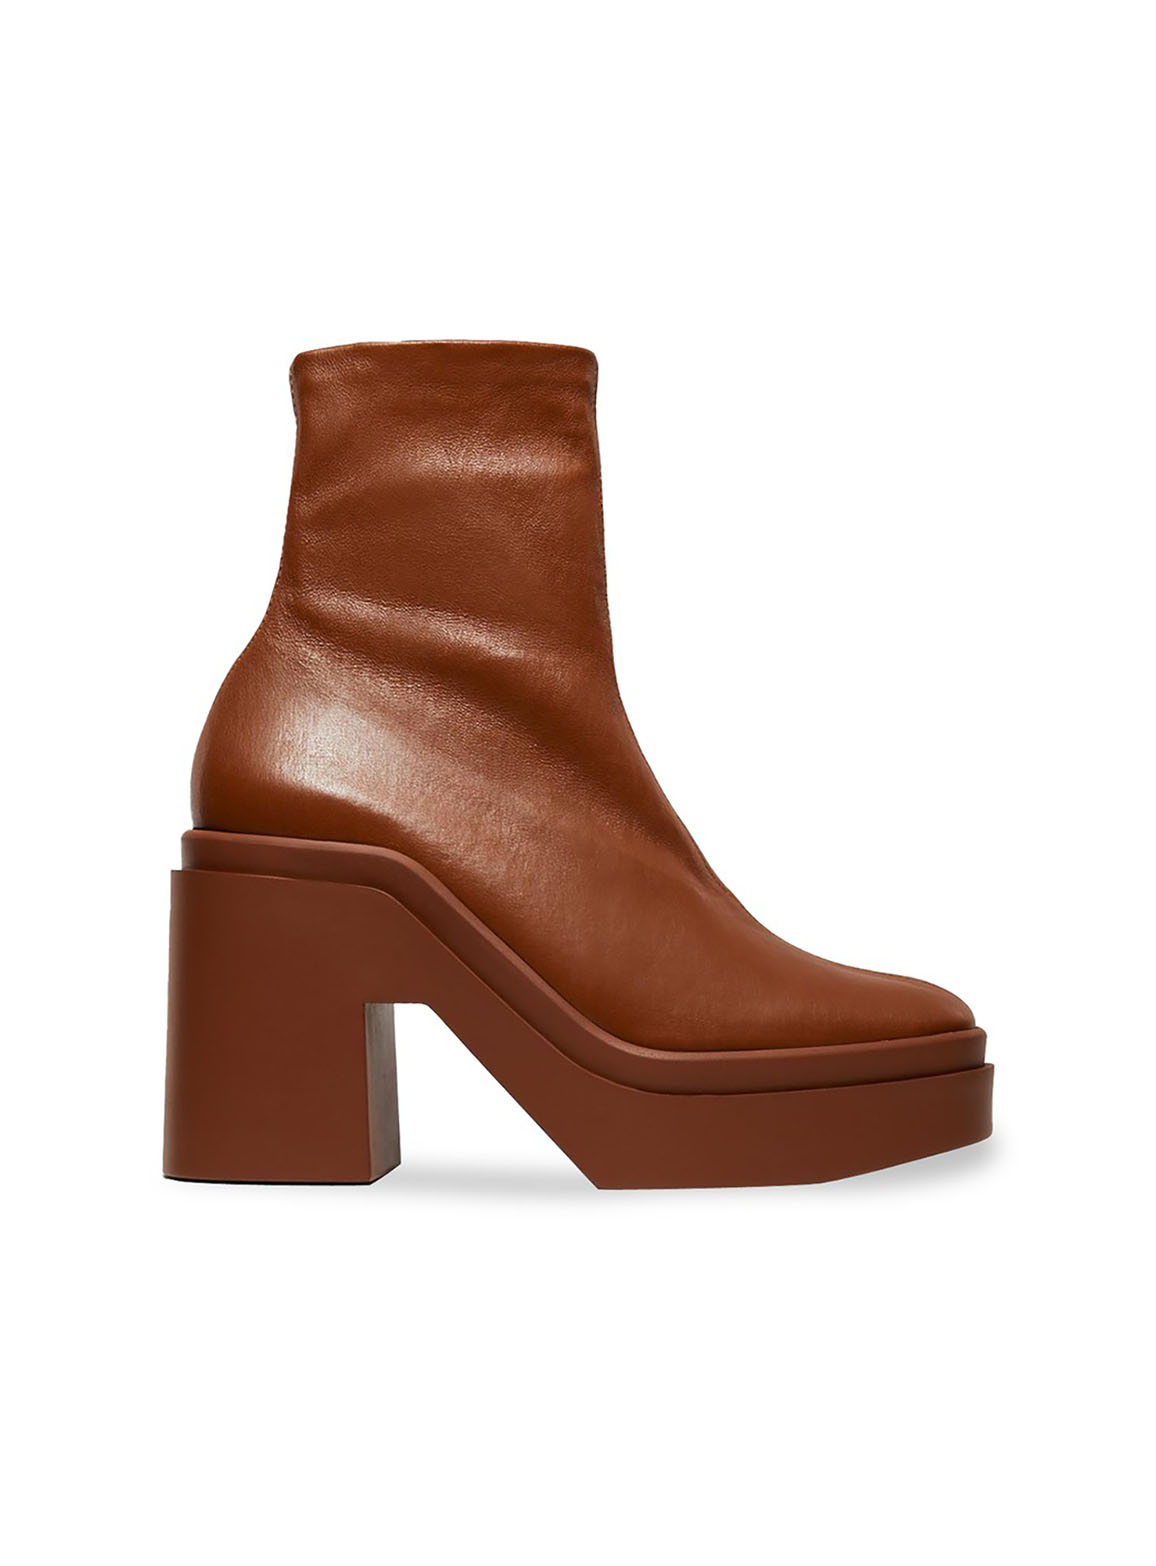 Ninaa ankle boots